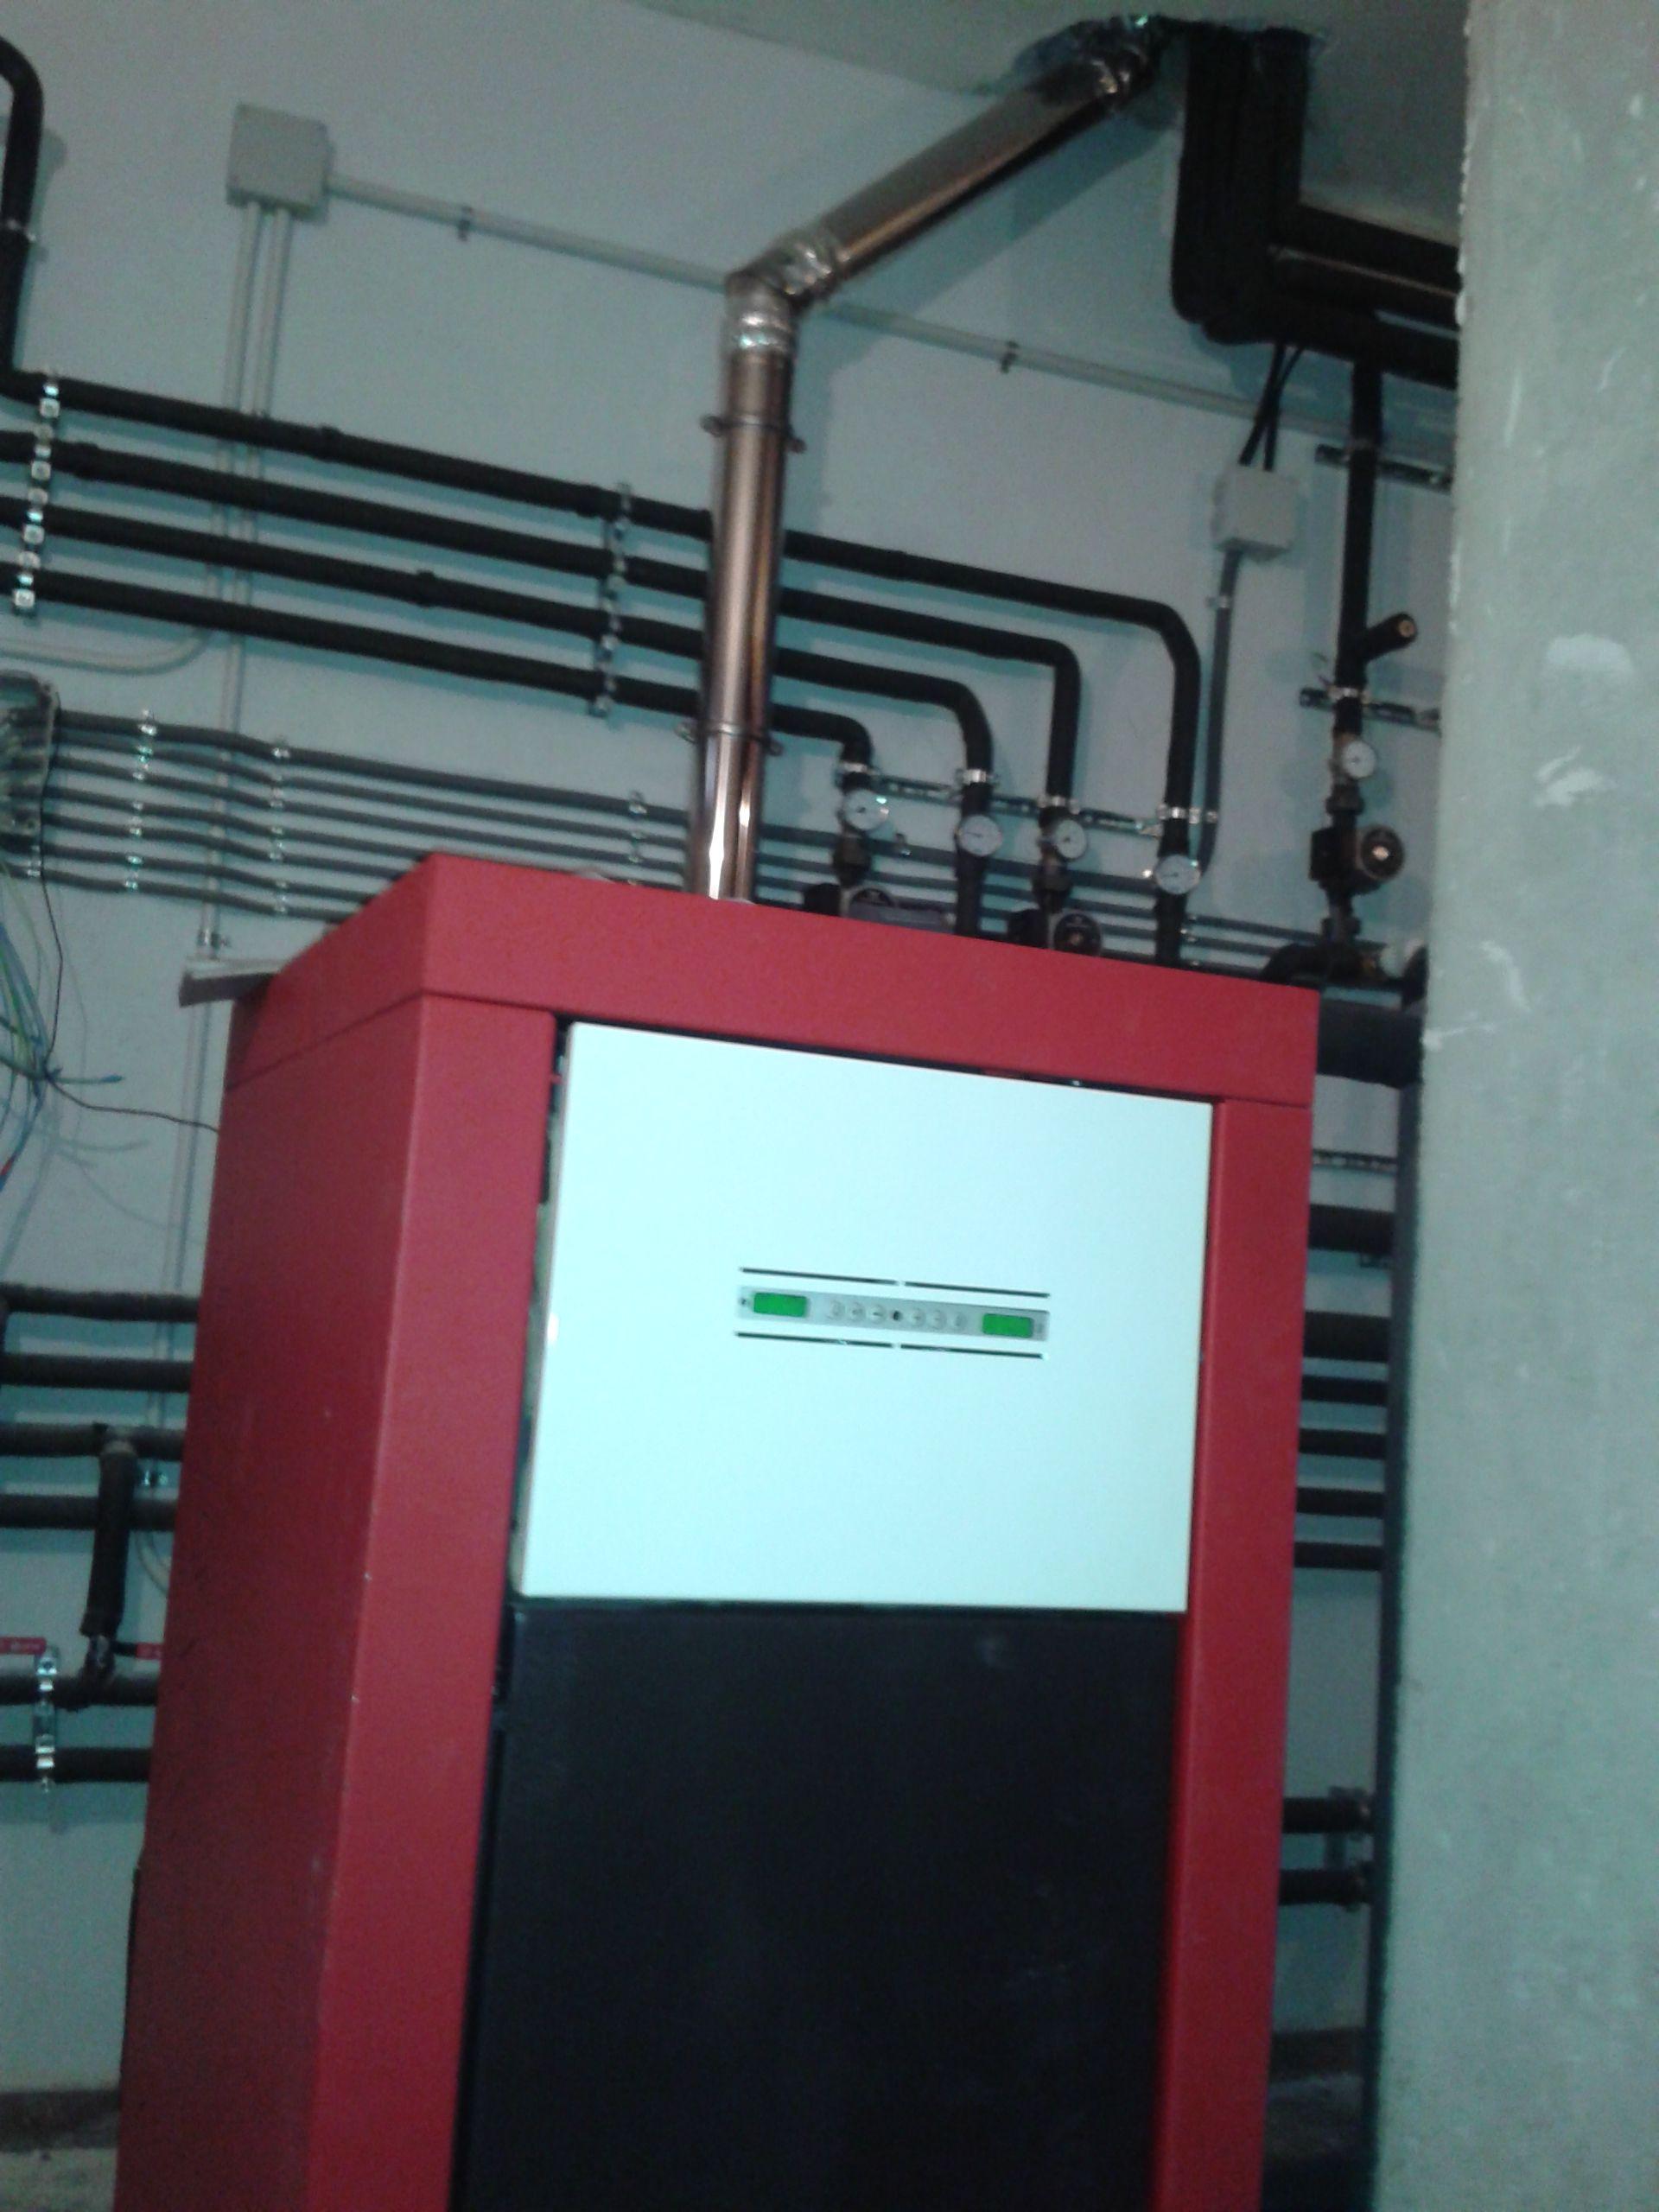 caldera de pellets para radiadores caldera de pellet edilkamin basic para radiadores y agua